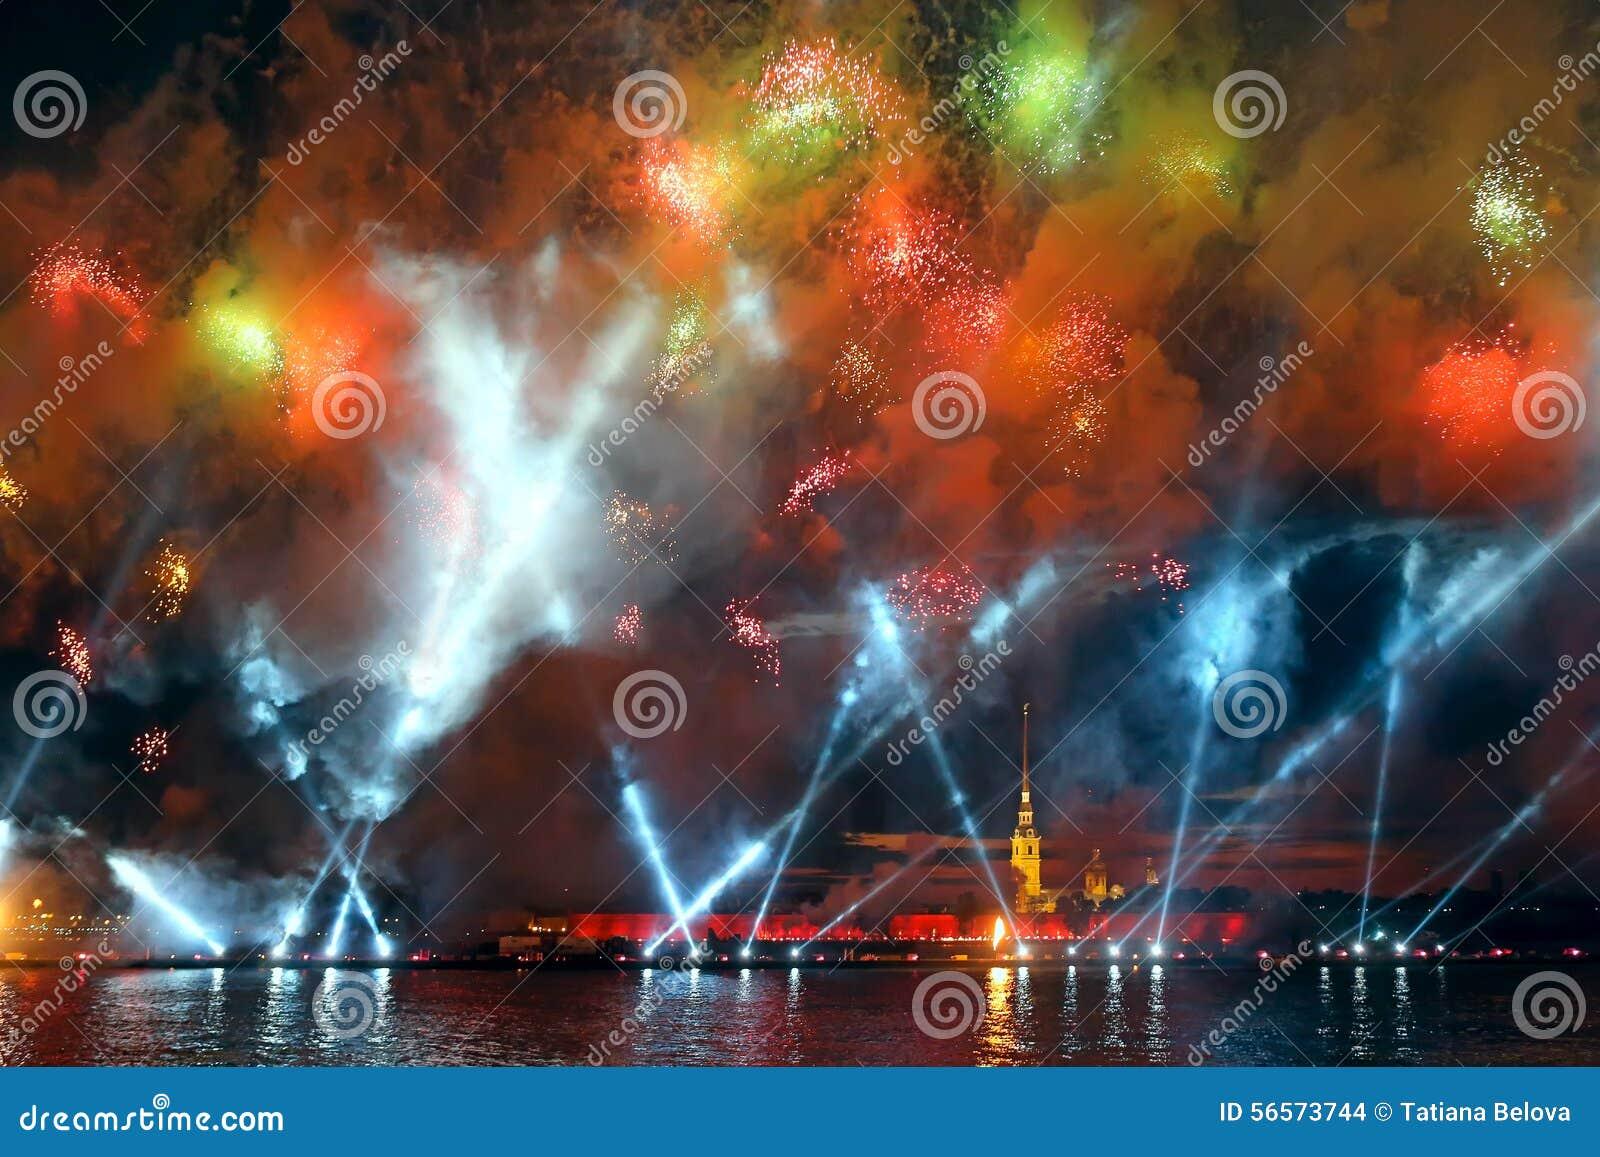 Download Τα ερυθρά πανιά εορτασμού παρουσιάζουν κατά τη διάρκεια του άσπρου φεστιβάλ νυχτών Εκδοτική Στοκ Εικόνα - εικόνα από βράδυ, εορτασμός: 56573744